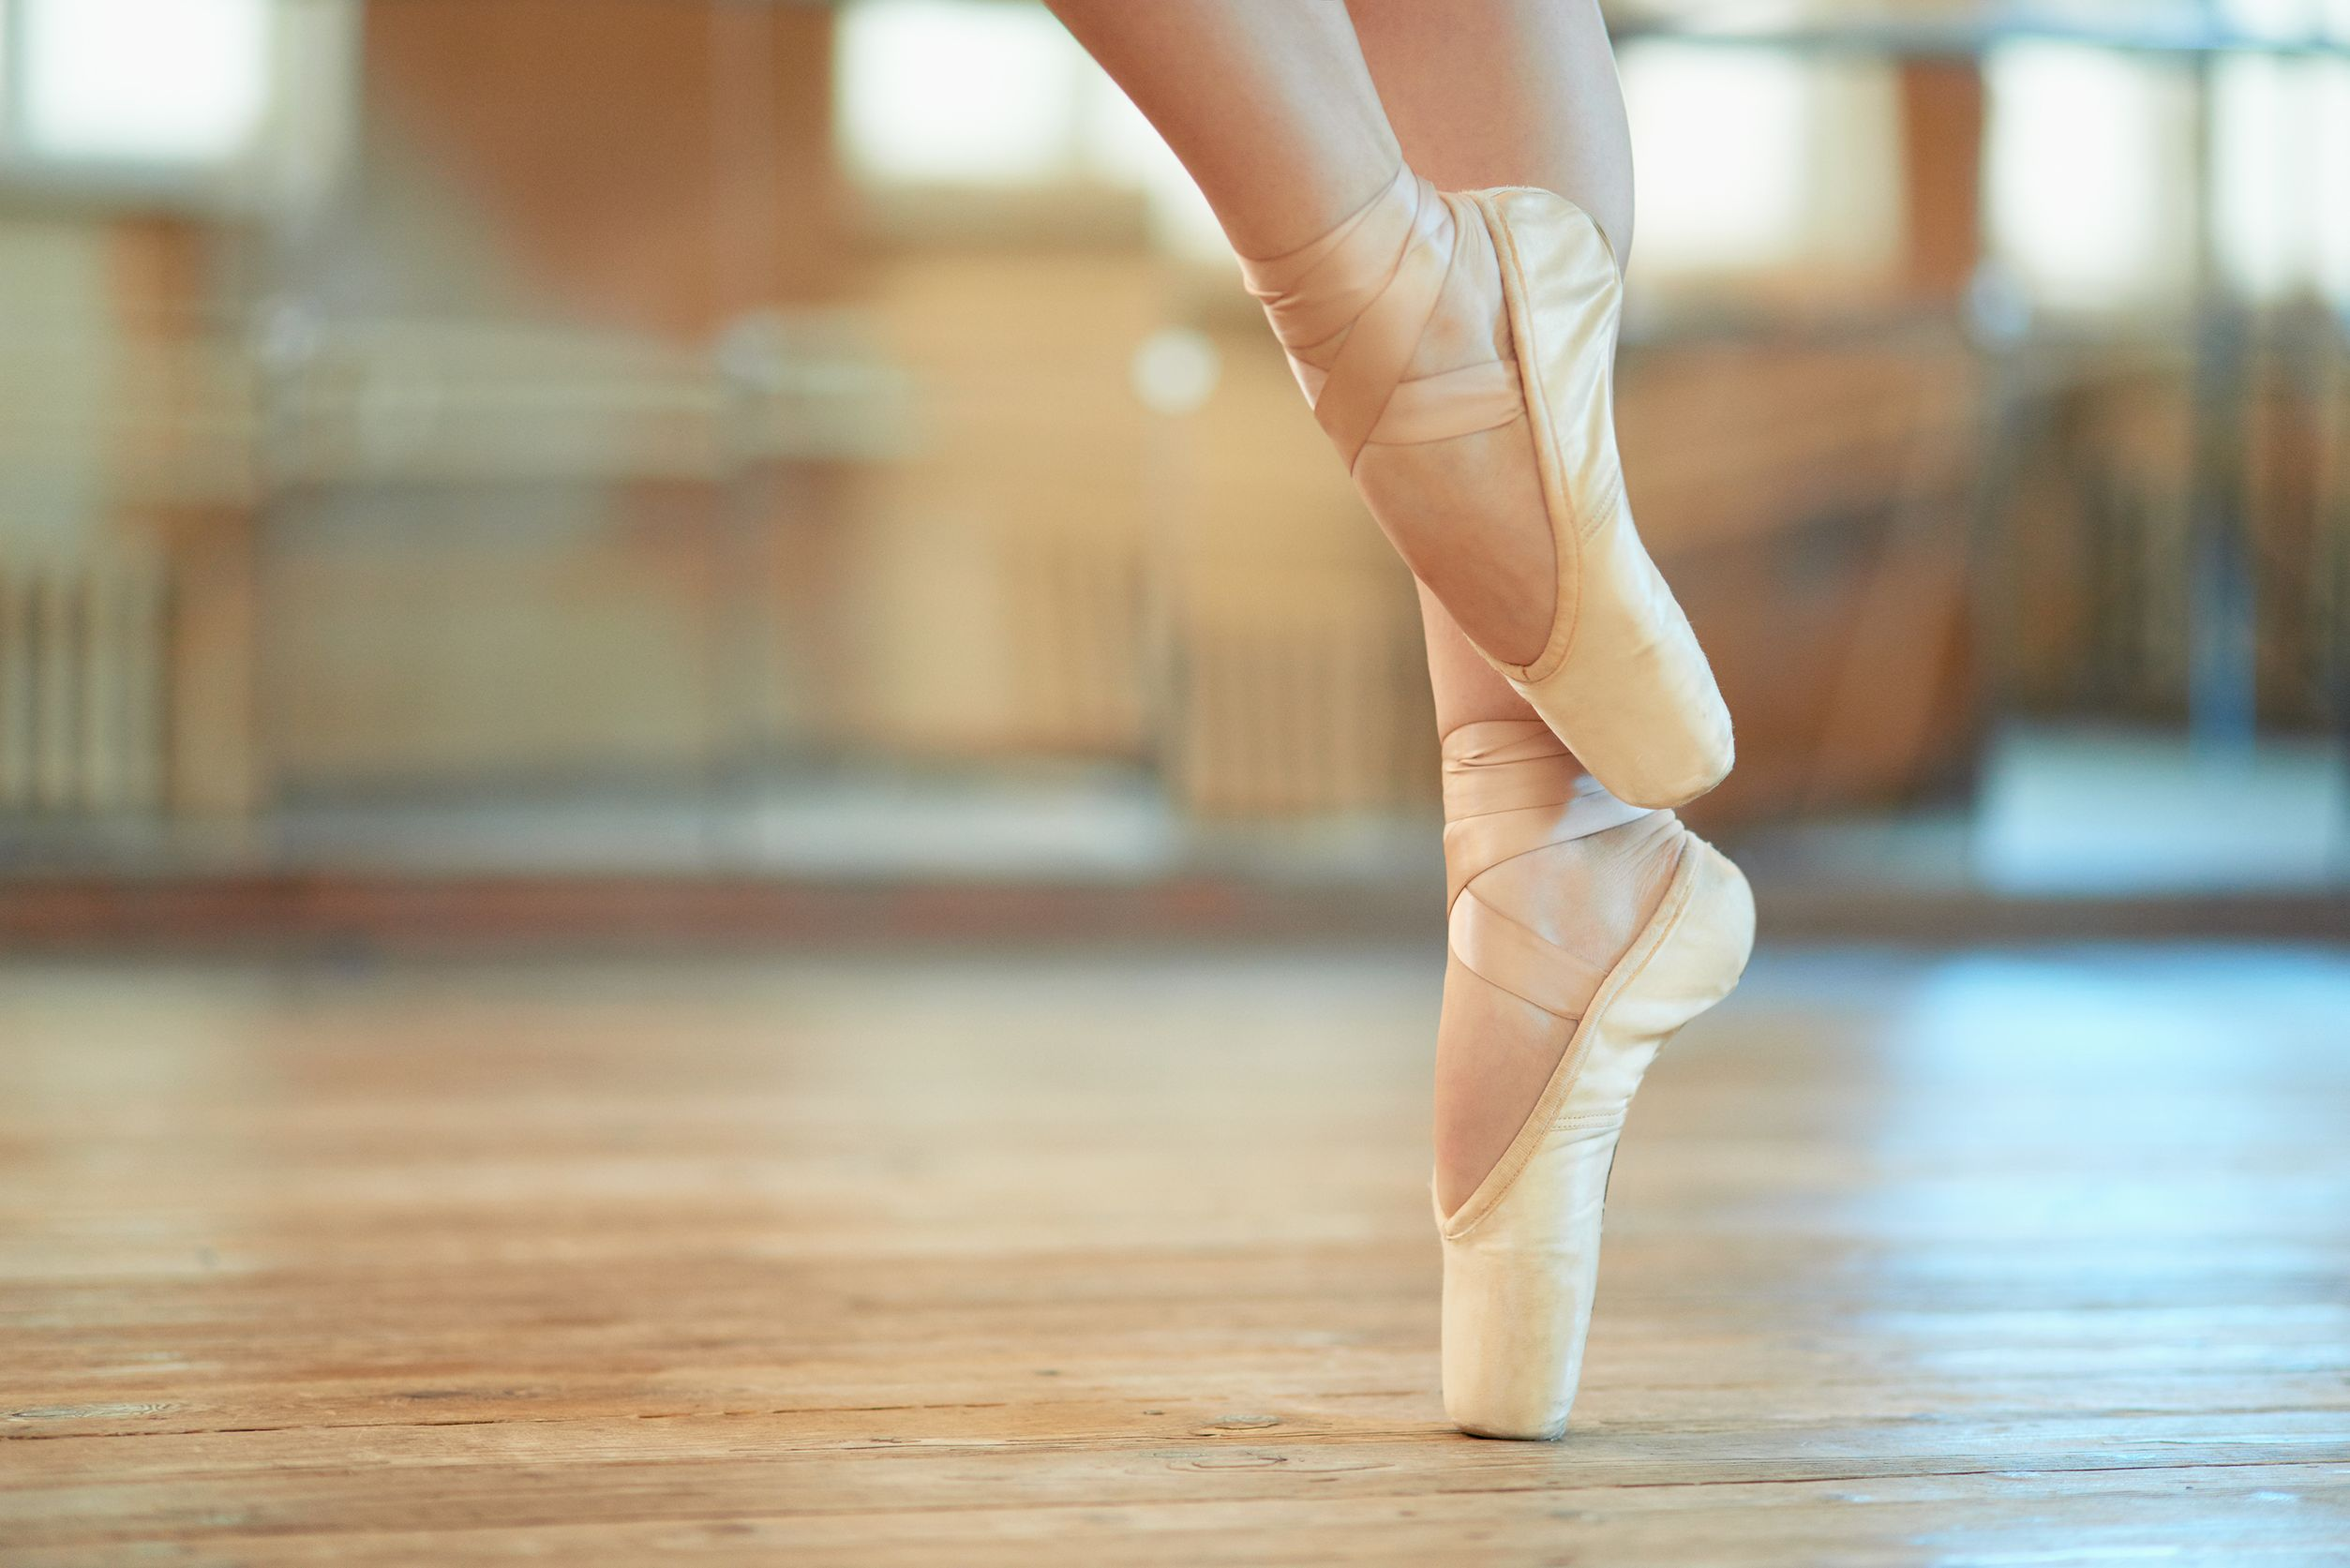 37036734 – beautiful legs of a dancer in pointe